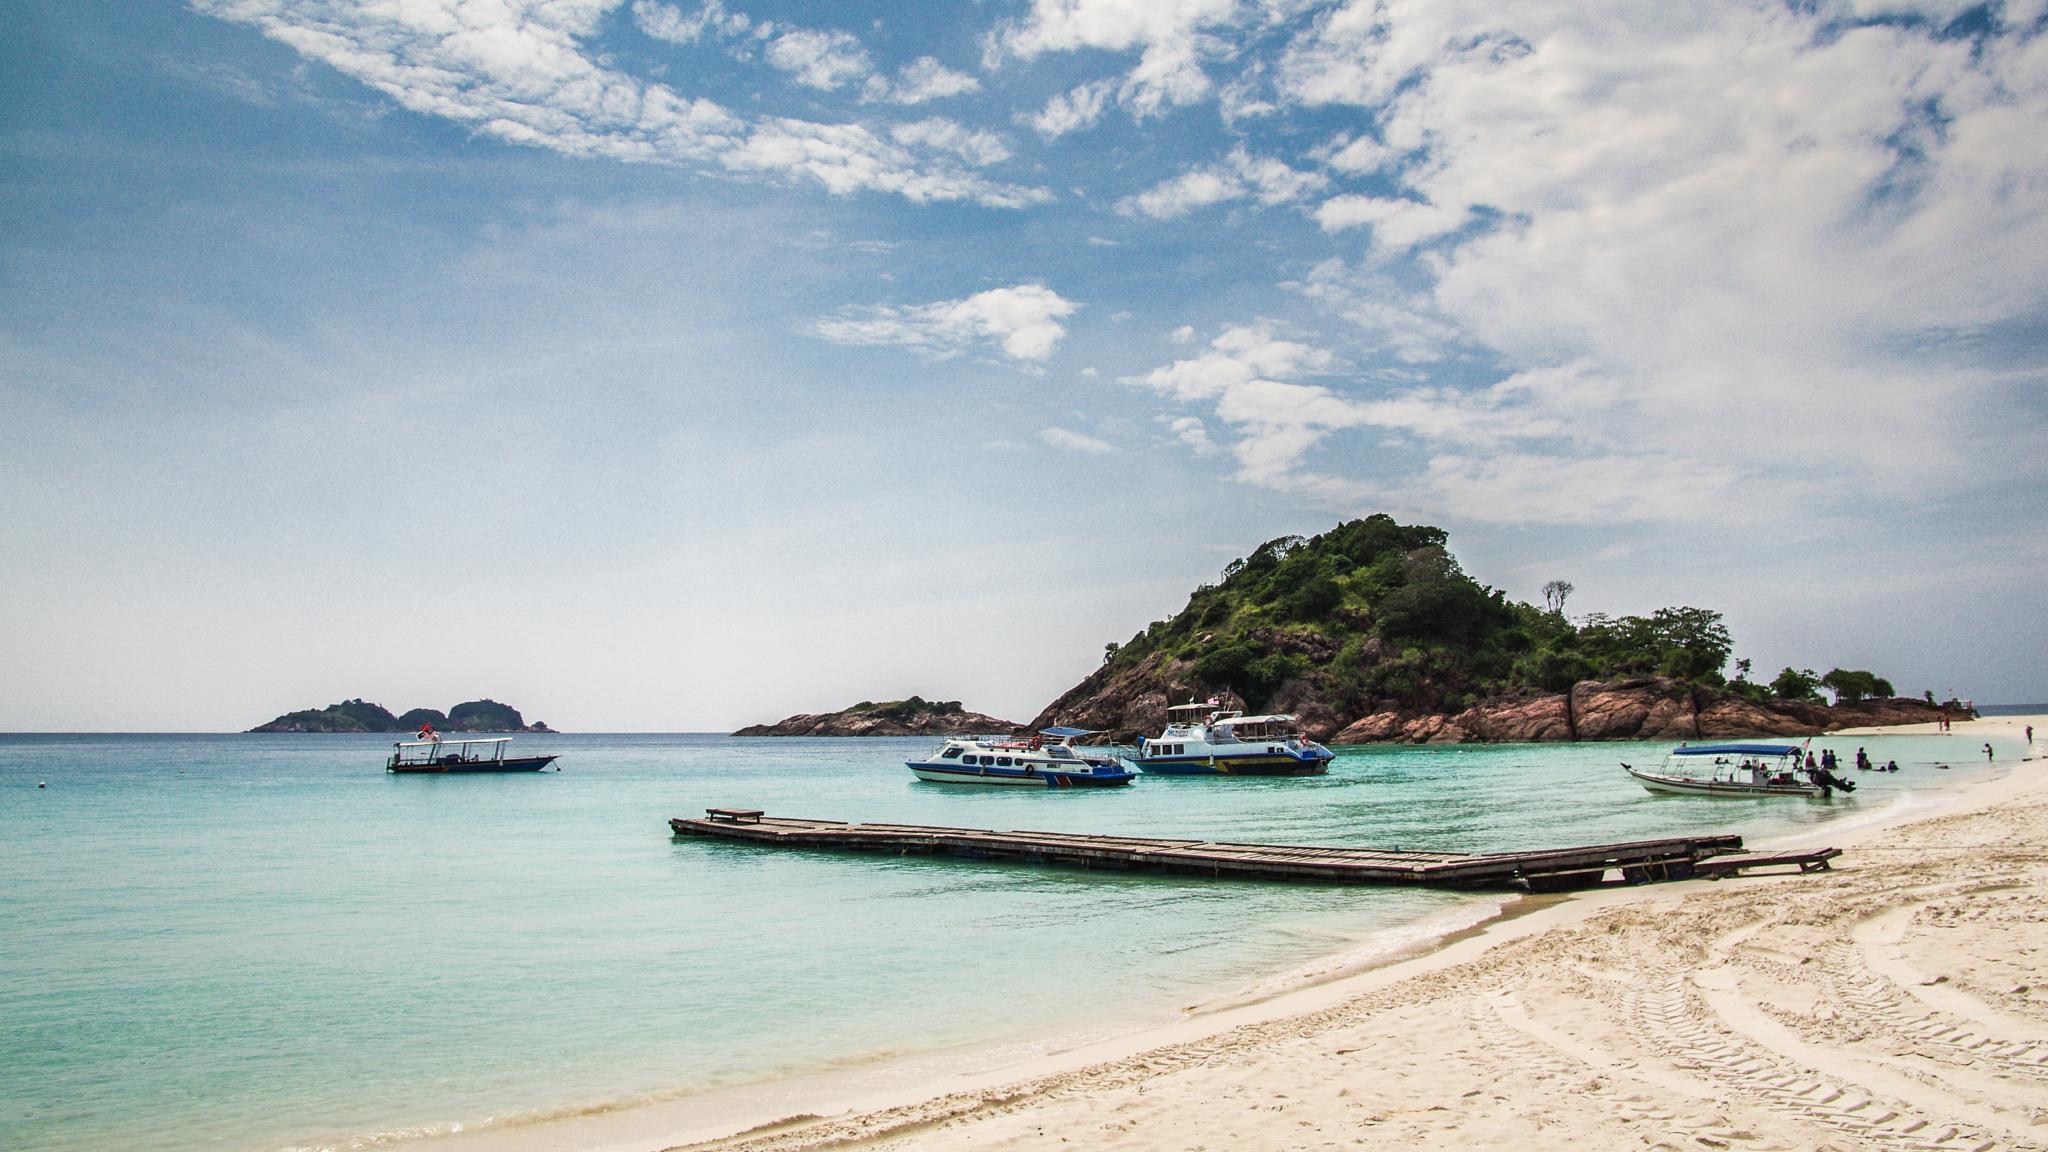 Pulau Redang Malaysia by SamChow